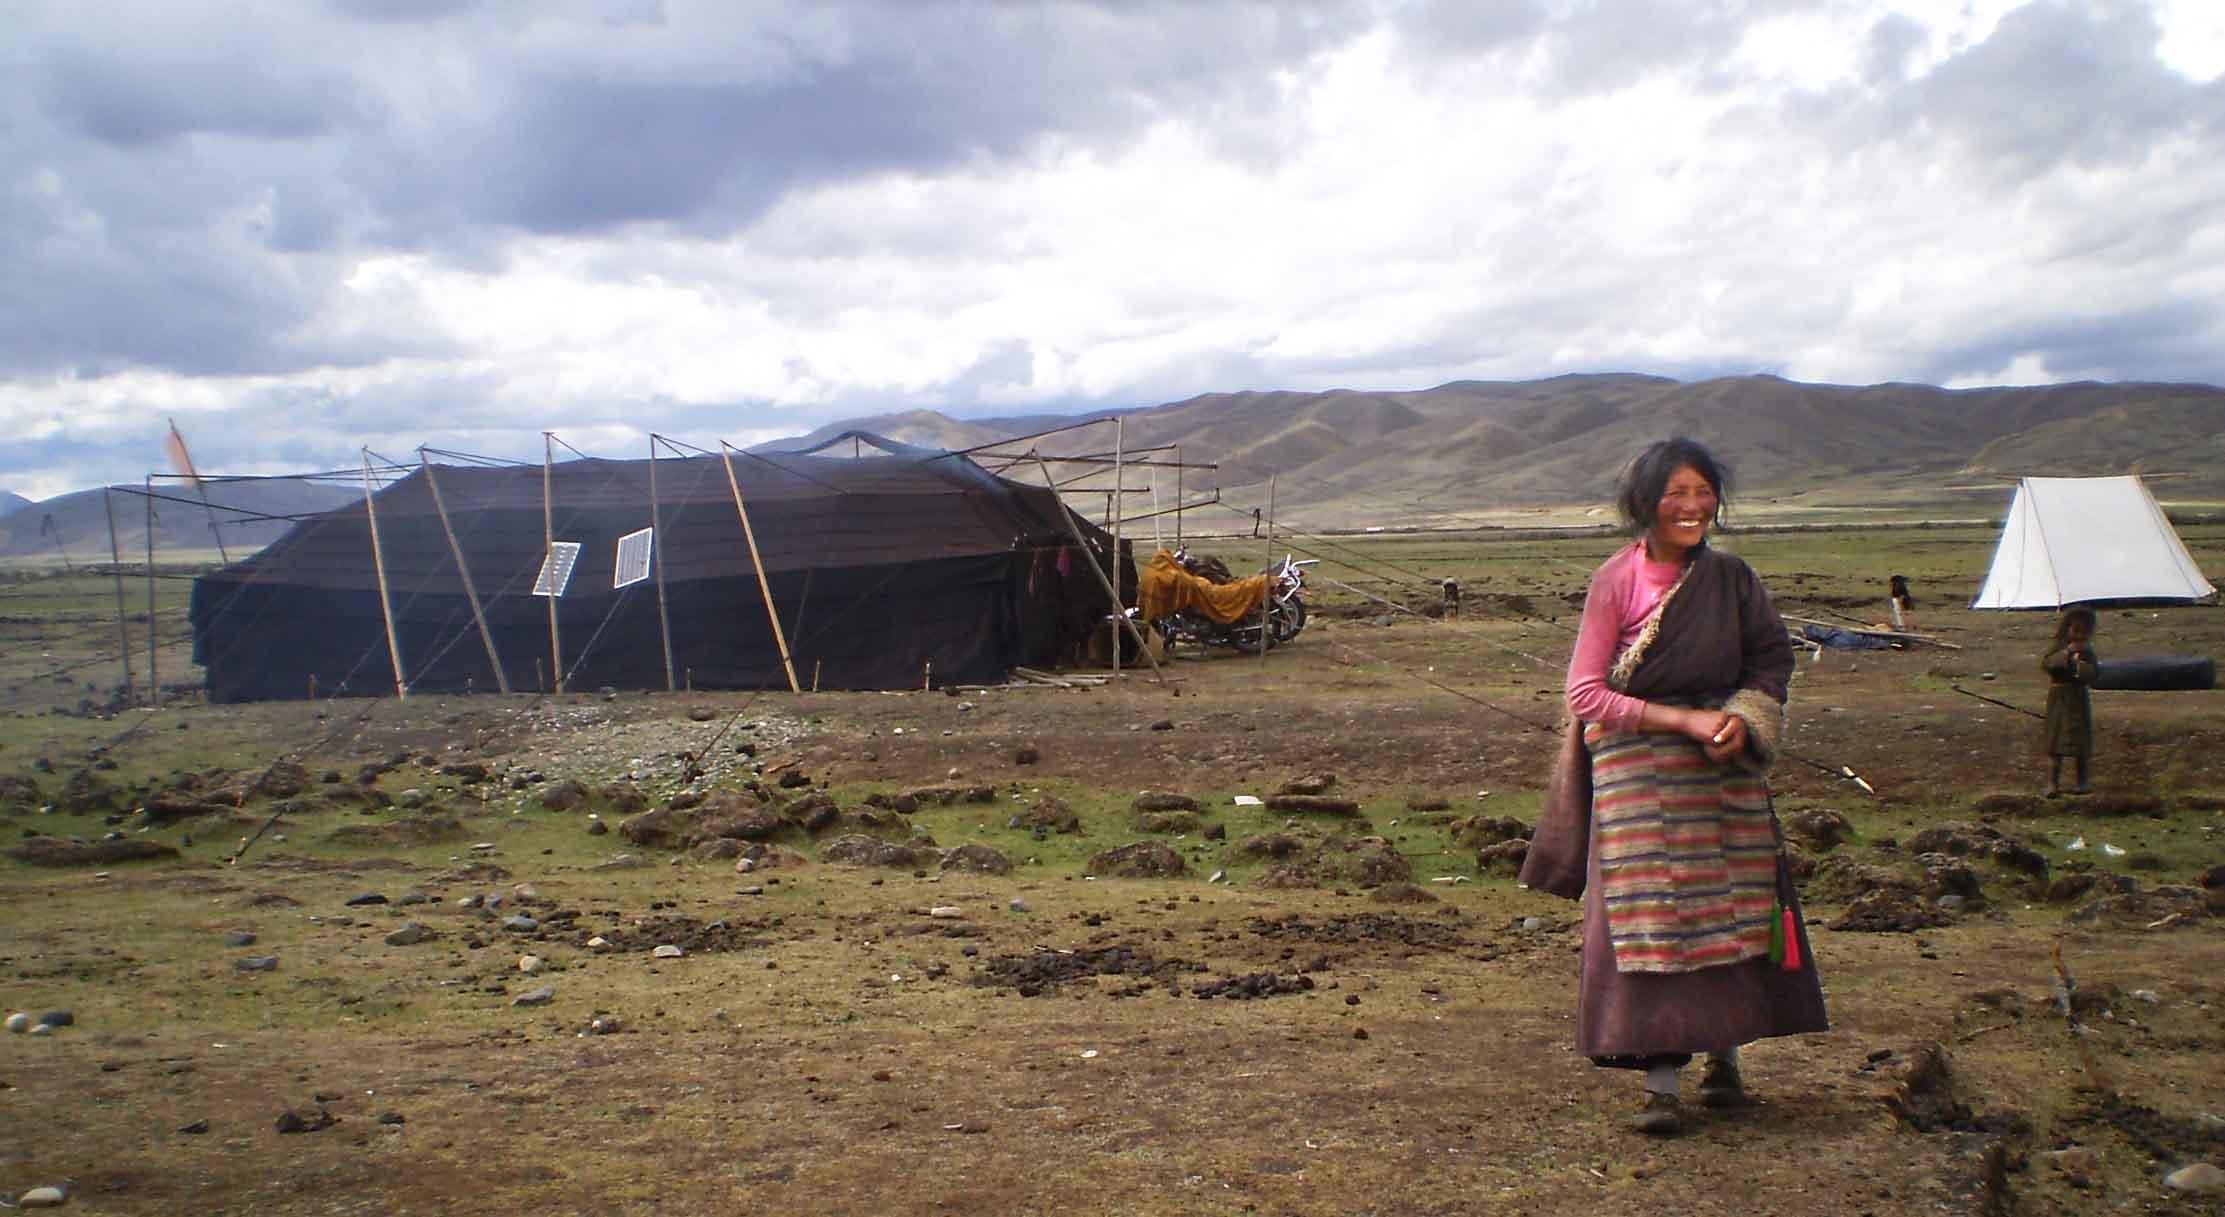 Litang - Cha Ma Dao: The Tea Horse Road